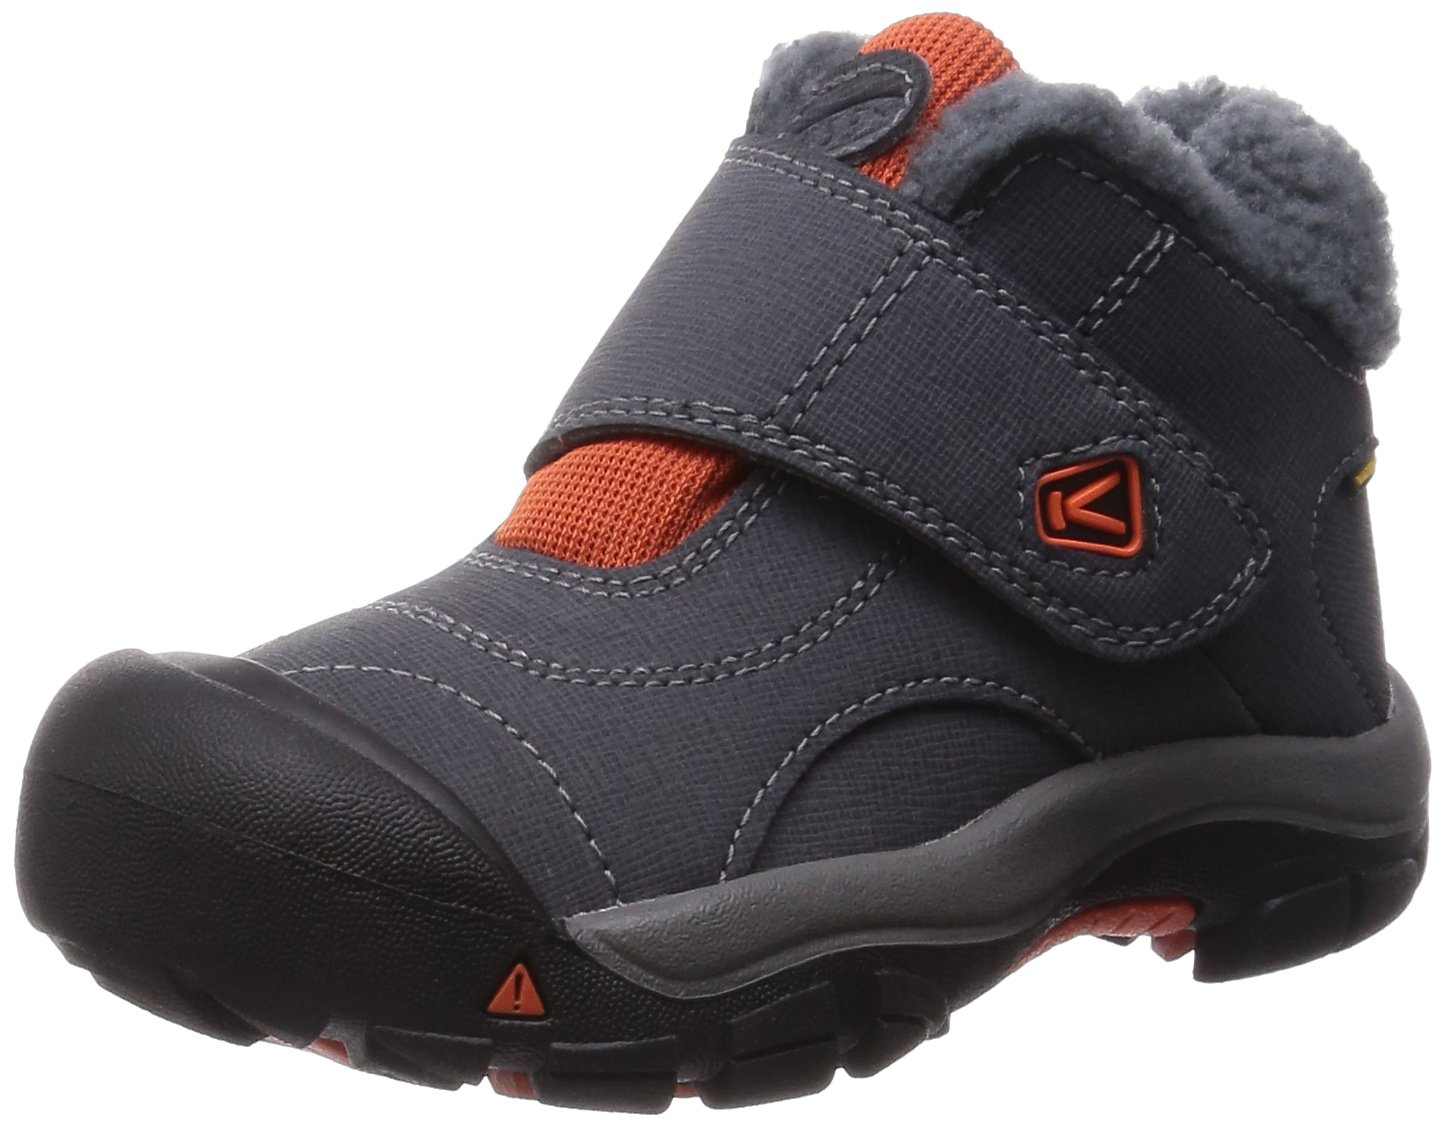 KEEN Kootenay Waterproof Winter Boot (Toddler/Little Kid), Magnet/Koi, 10 M US Toddler